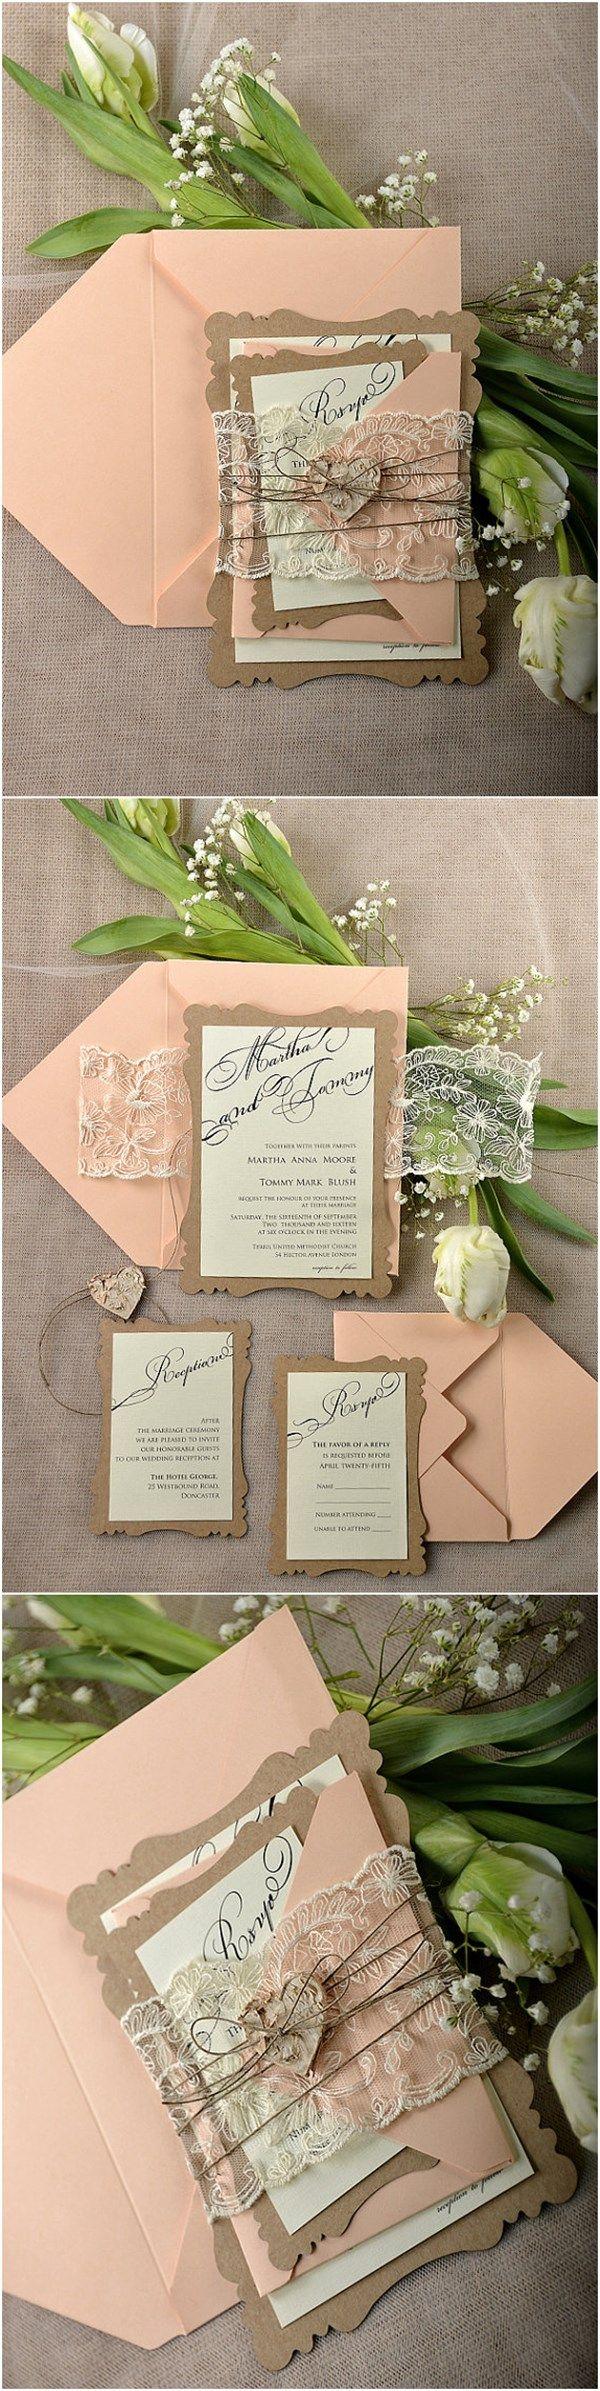 rustic wedding invitations rustic wedding invitation Rustic Eco Peach Lace Laser Cut Wedding Invitation Kits